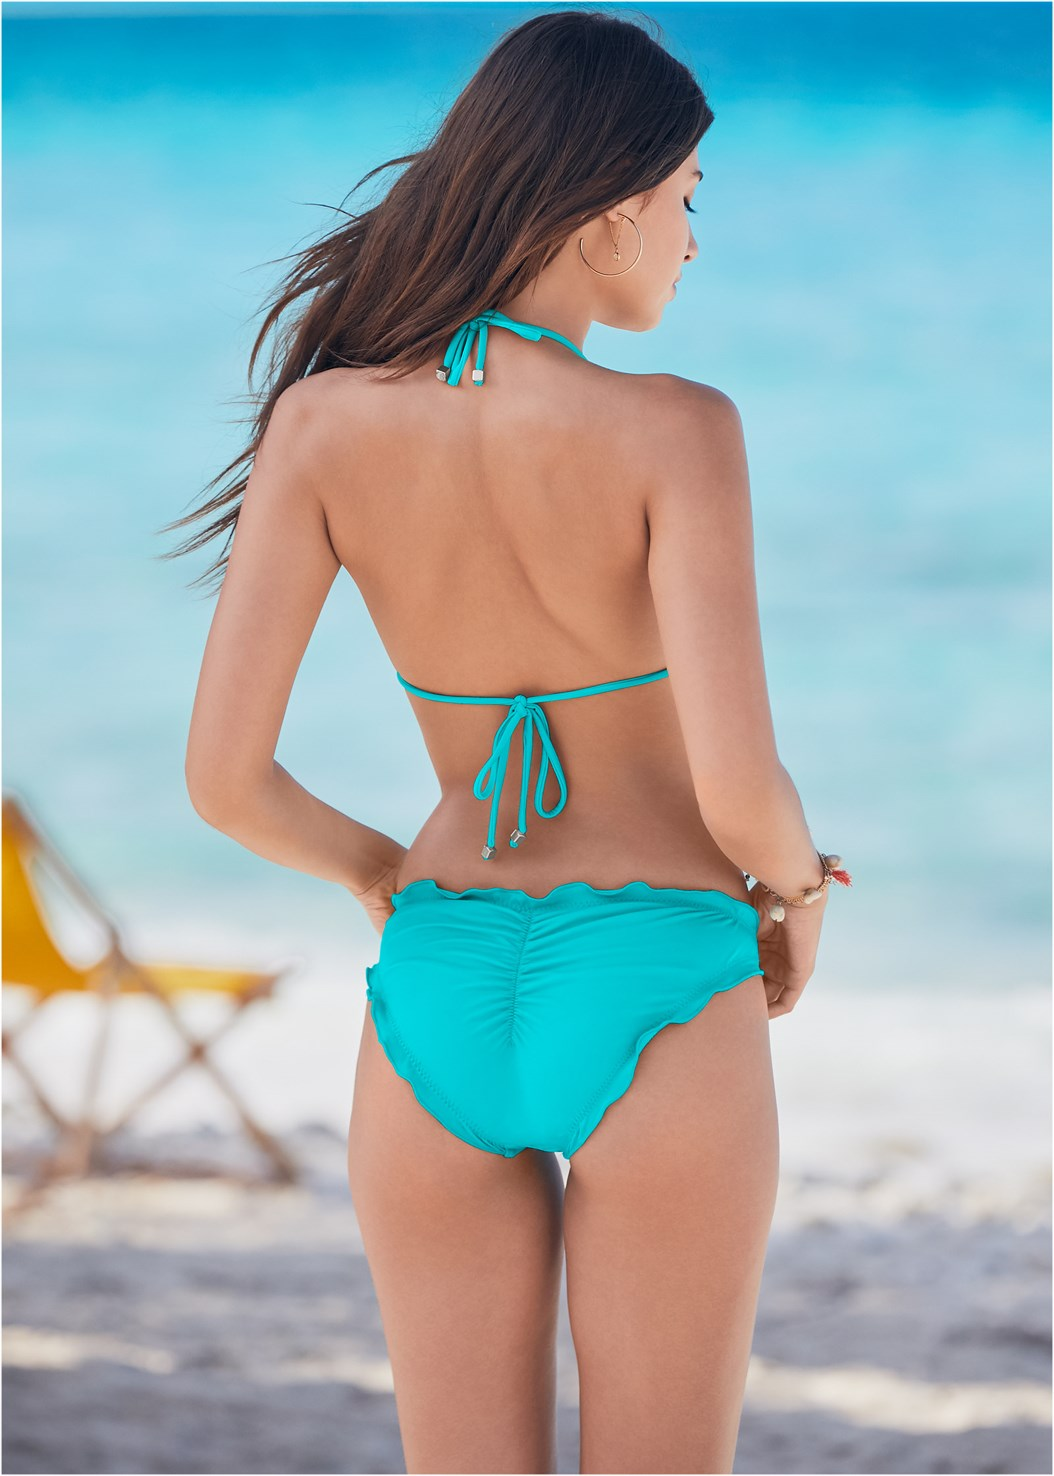 Ruffle Scrunch Back Bottom,Triangle String Bikini Top,Strappy Maxi Dress